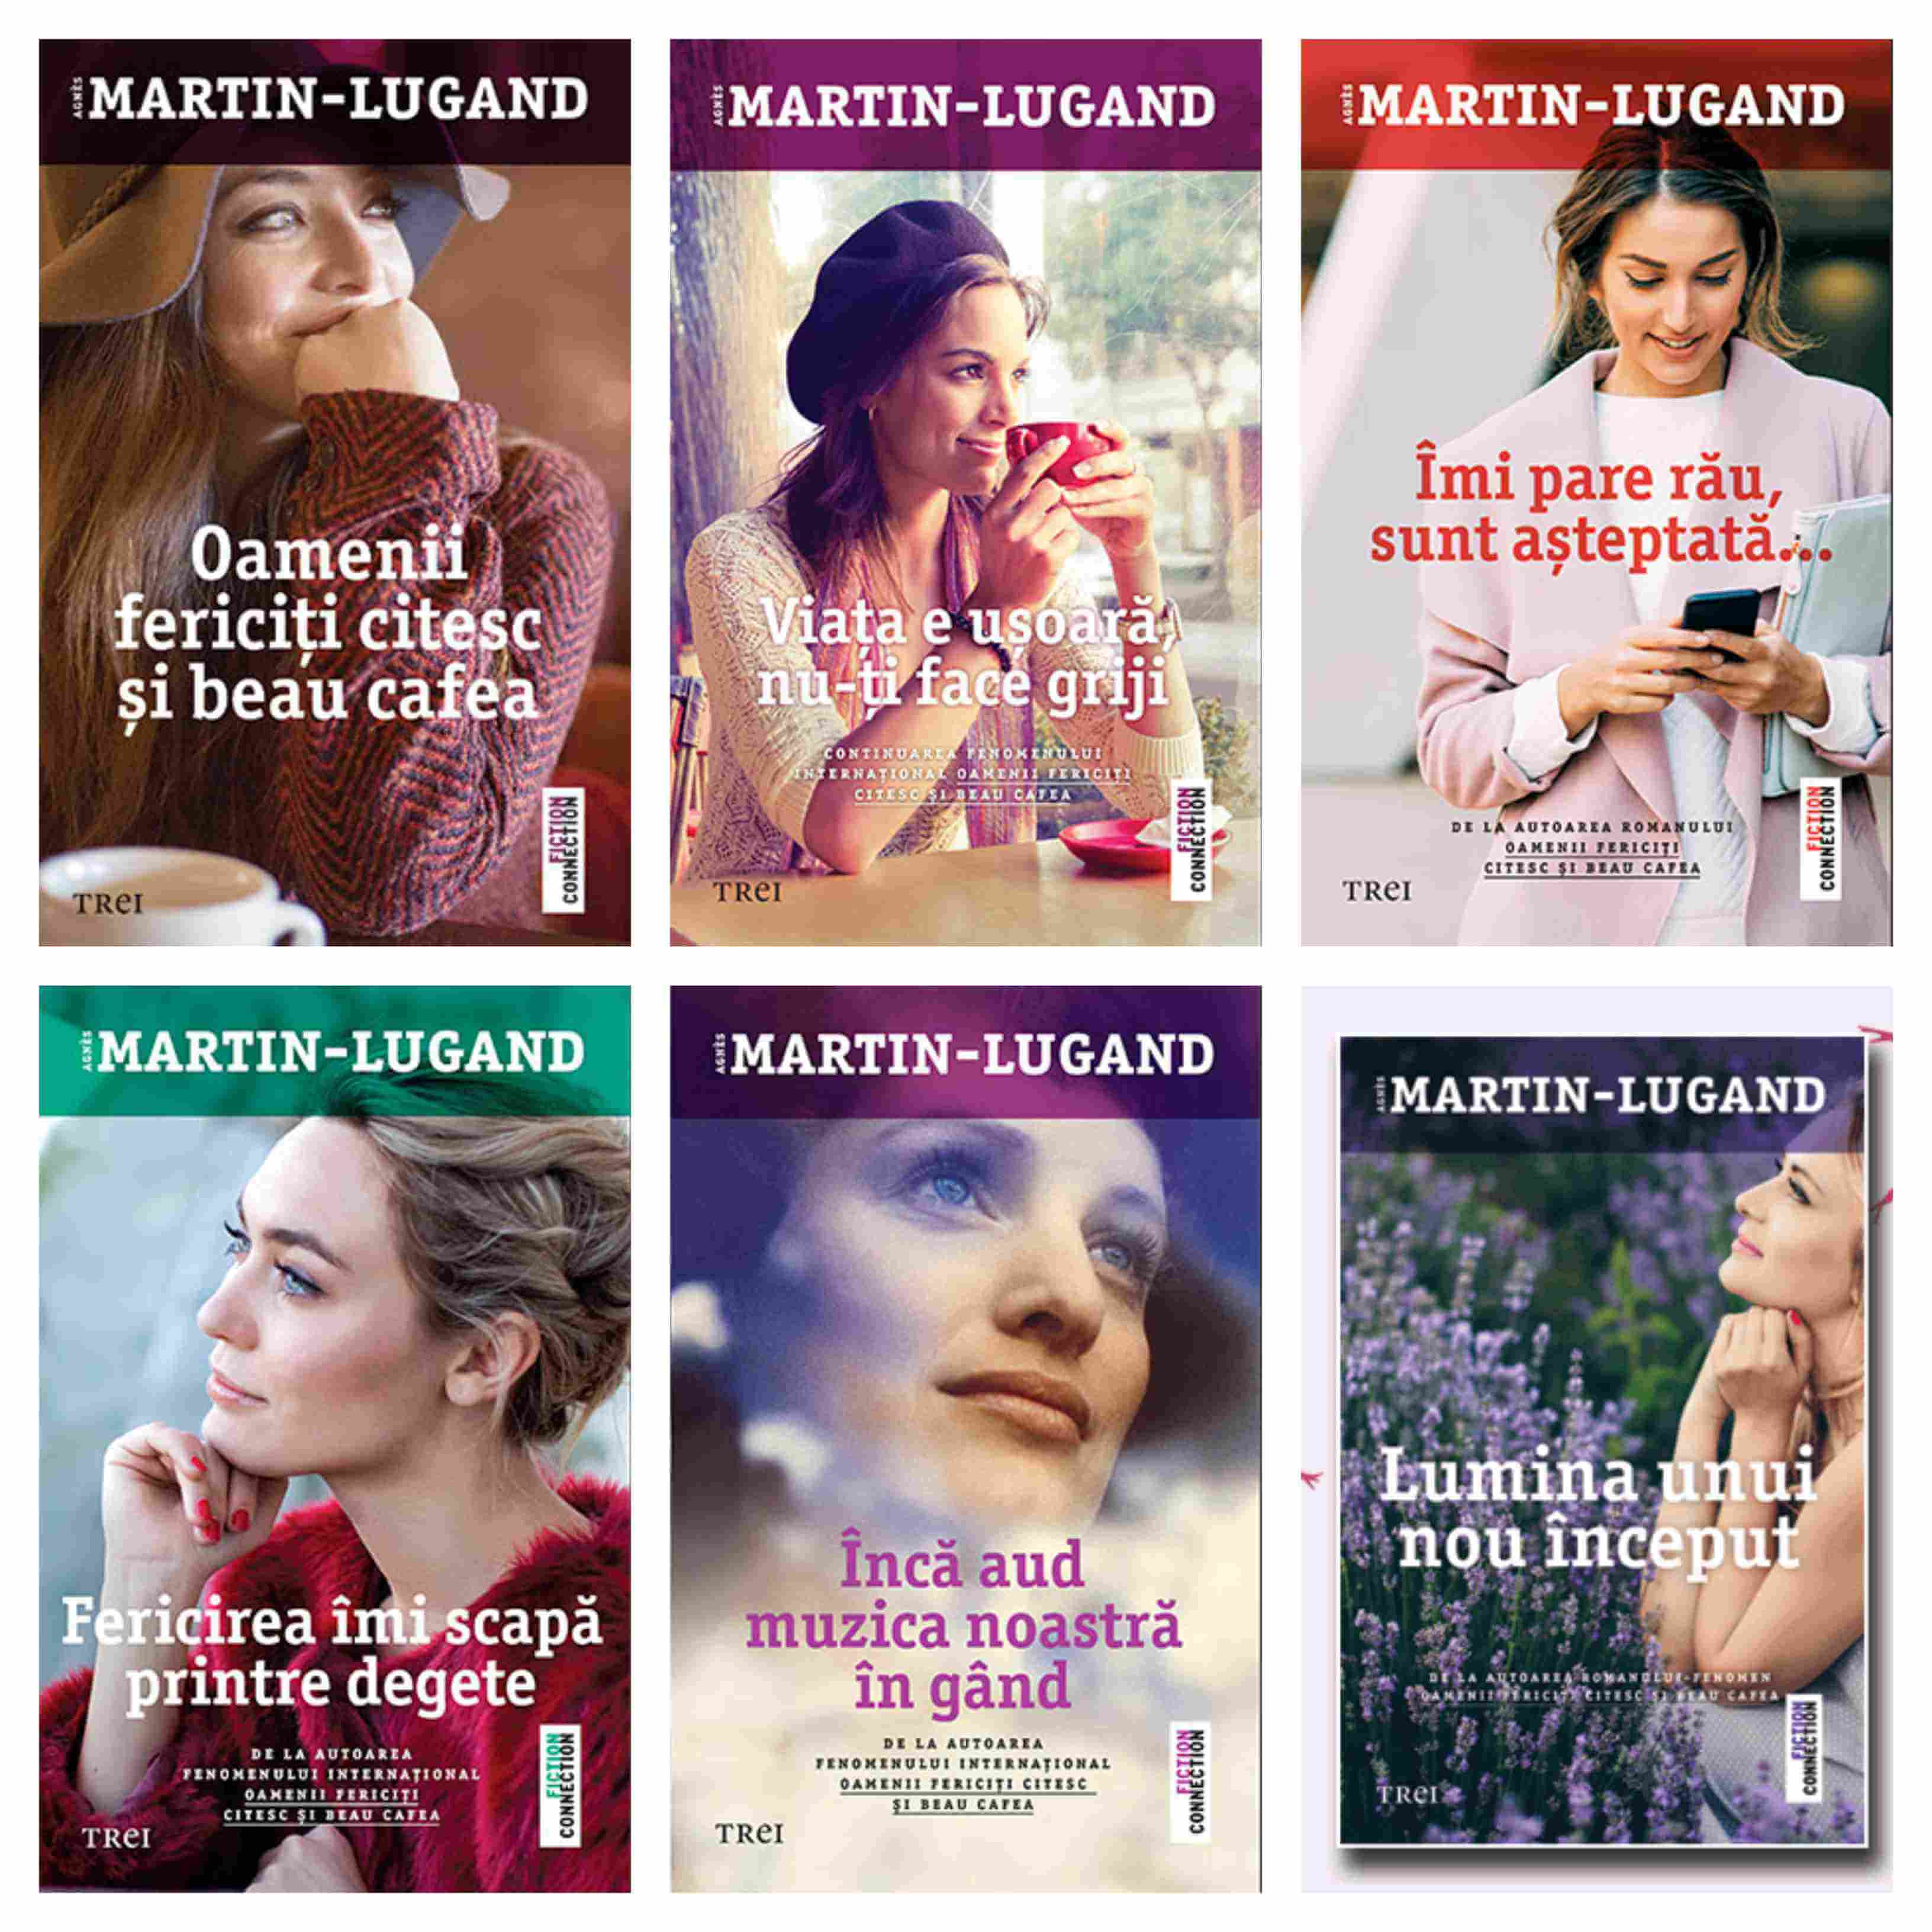 Carti Agnes Martin - Lugand - Editura Trei